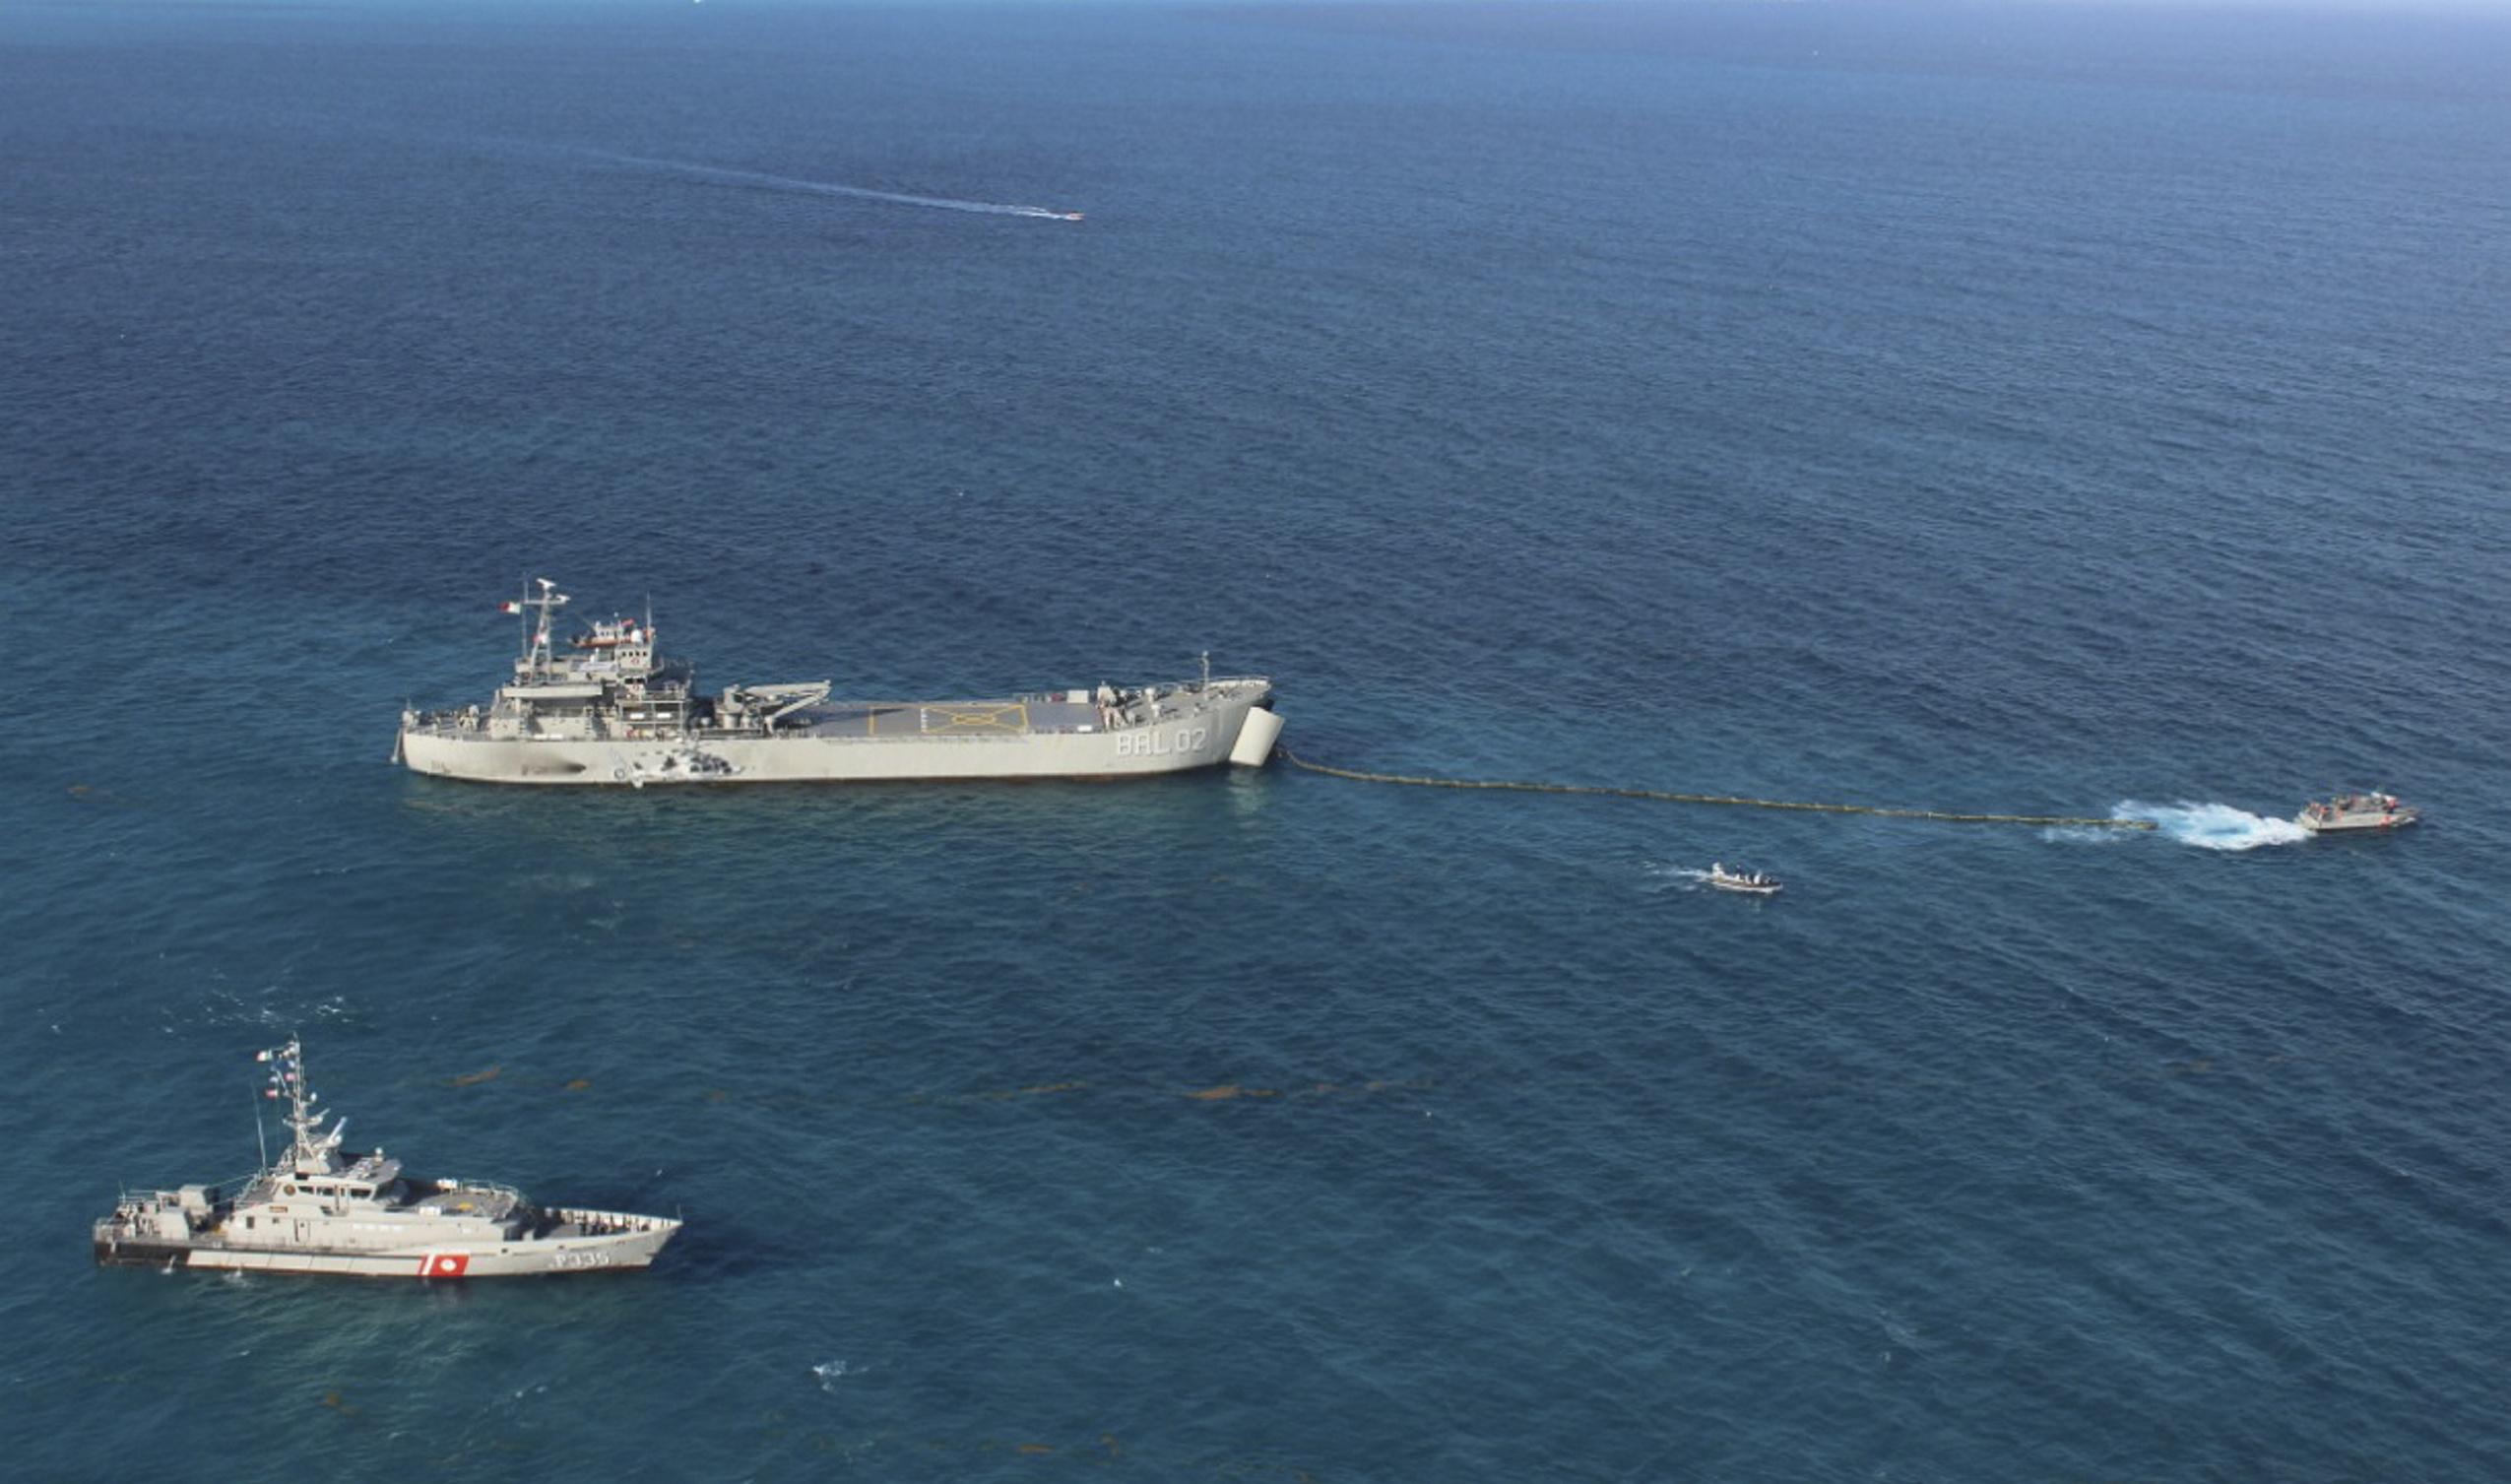 Marina combate sargazo en caribe mexicano